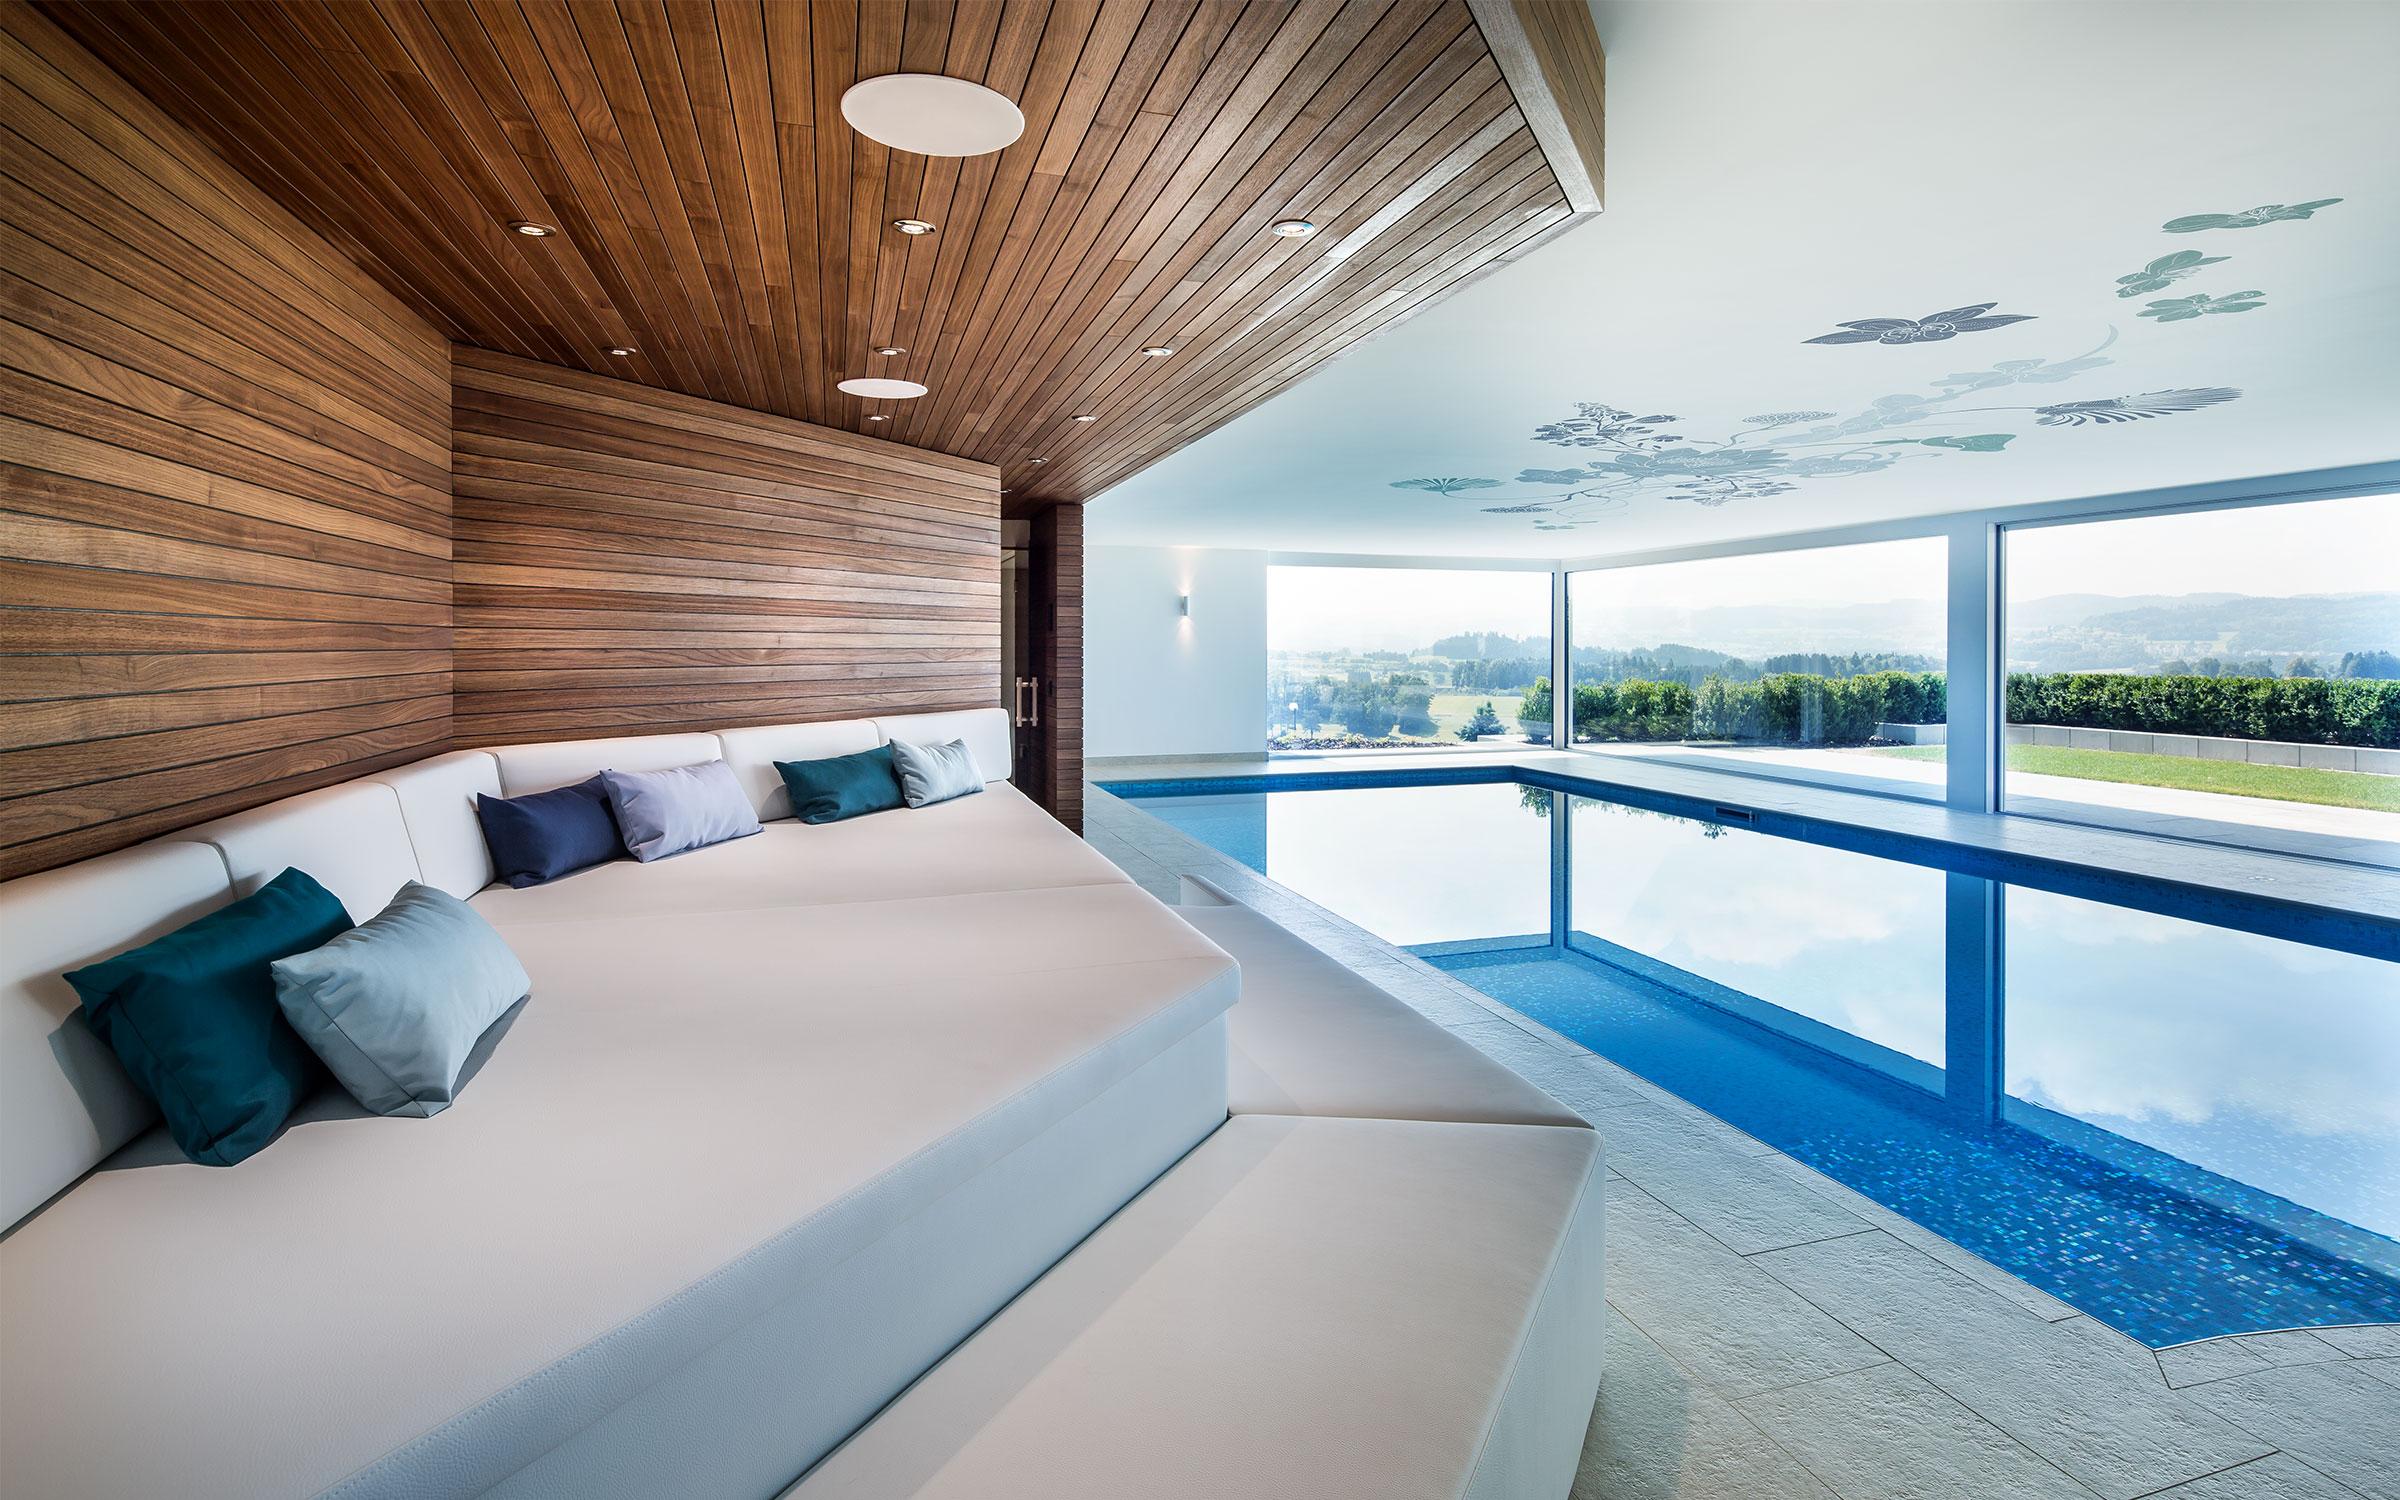 villa t dia dittel architekten. Black Bedroom Furniture Sets. Home Design Ideas